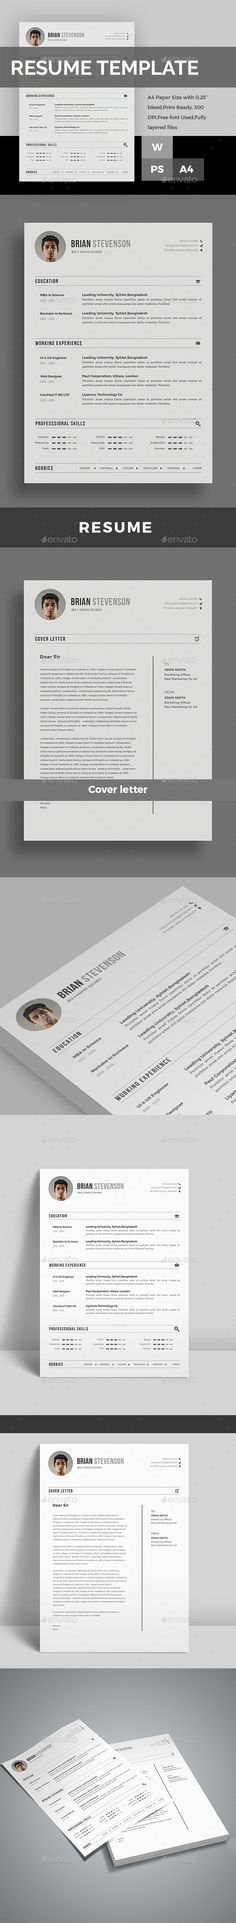 Material Resume Template AI, INDD, PSD Resume \/ CV Design - resume template psd